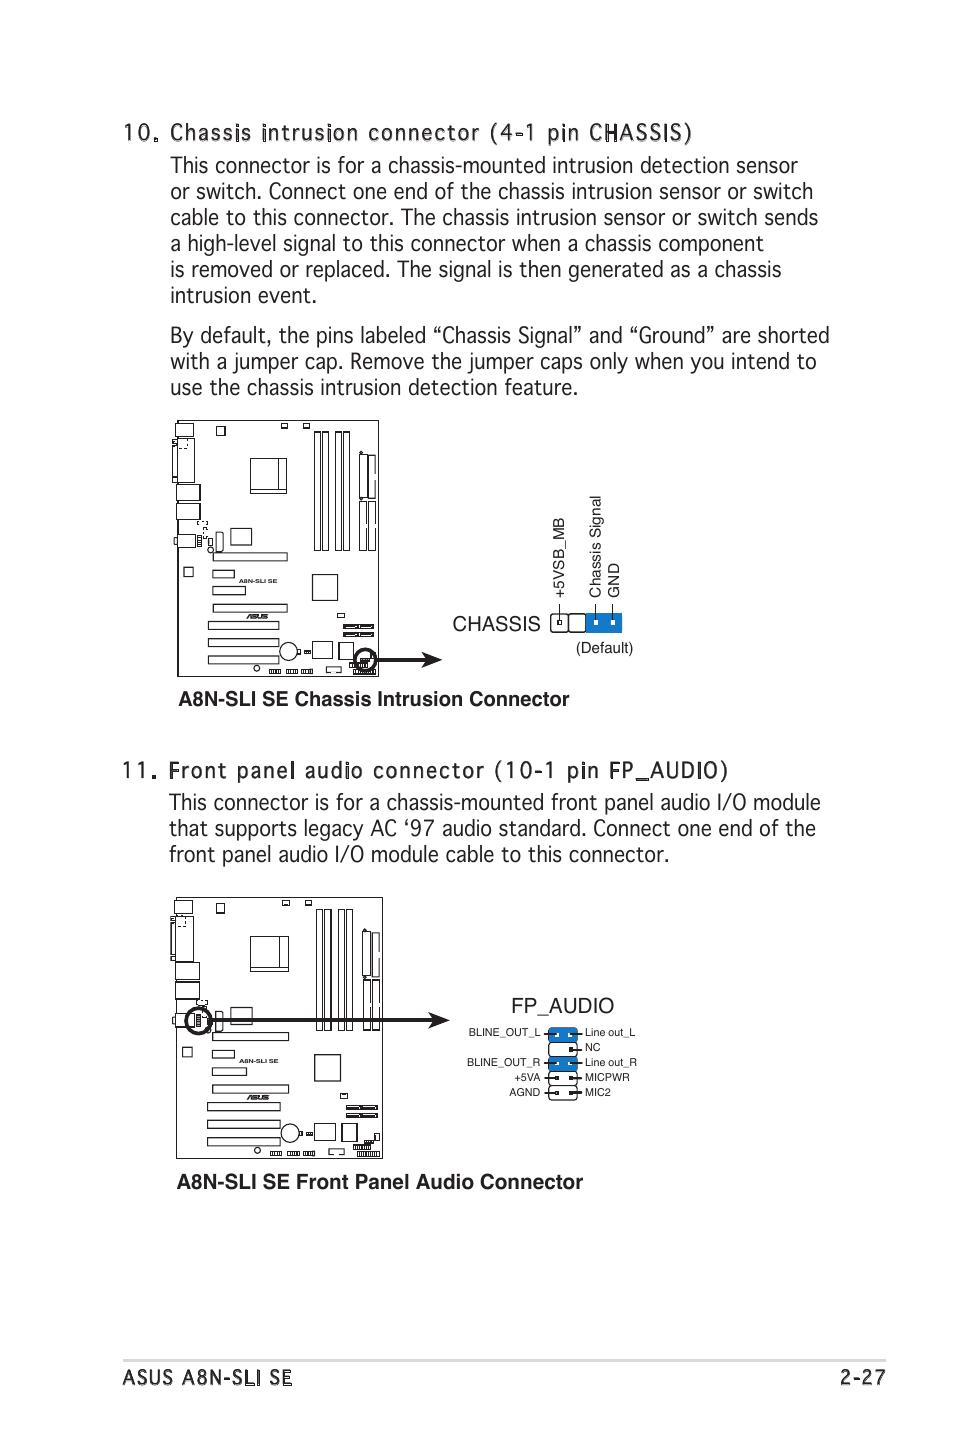 A8n-sli se front panel audio connector fp_audio, A8n-sli se chassis  intrusion connector chassis | Asus Motherboard A8N-SLI SE User Manual |  Page 51 / 152